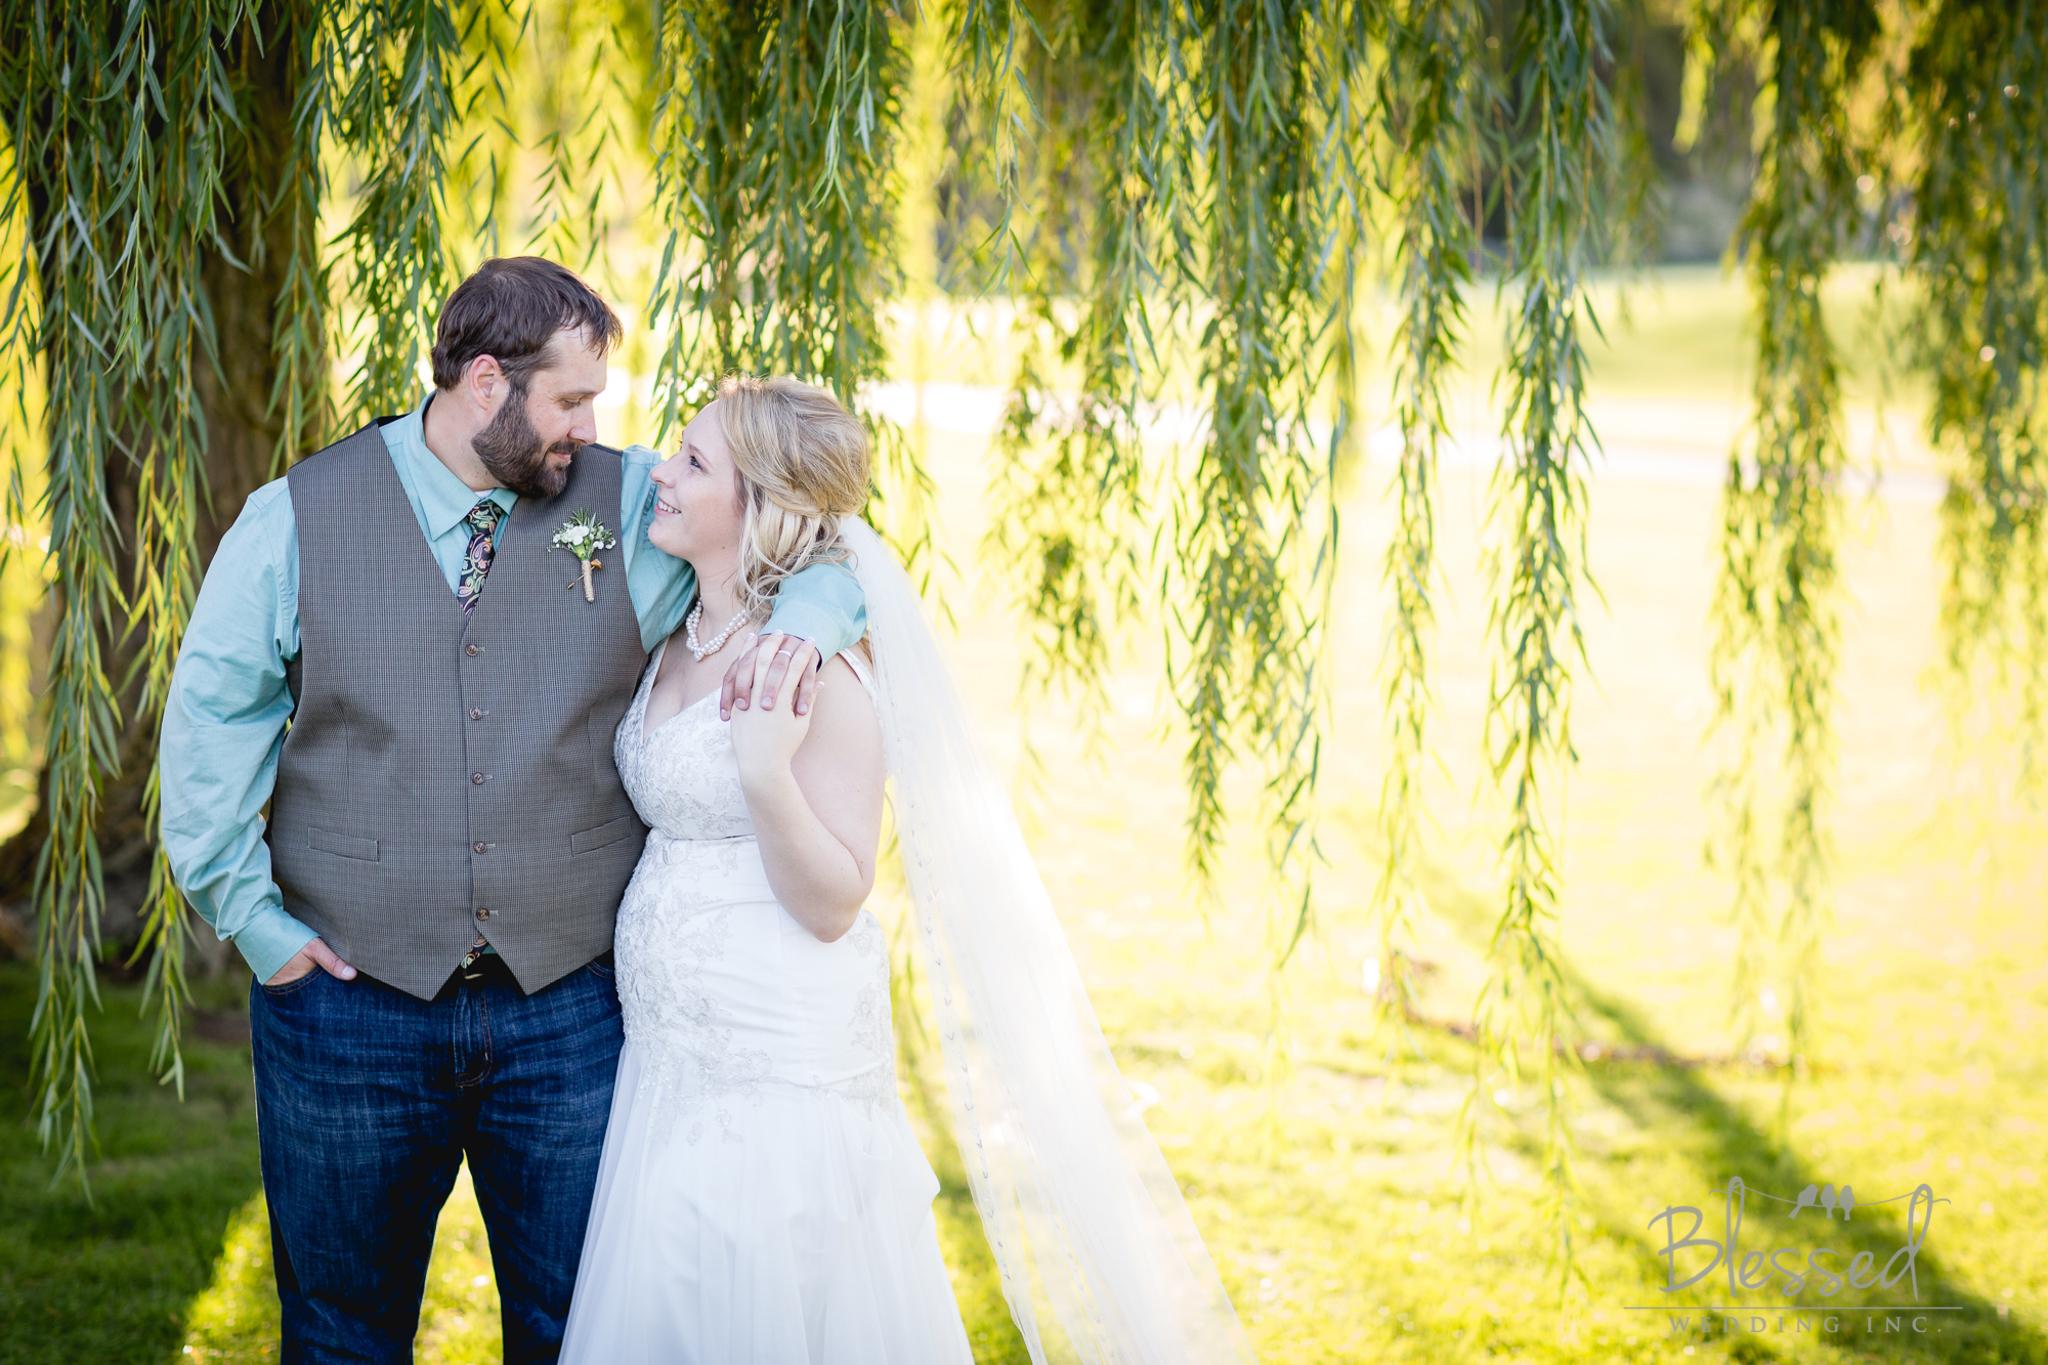 Destination Wedding Photography Minnesota By Blessed Wedding Photographers-110.jpg